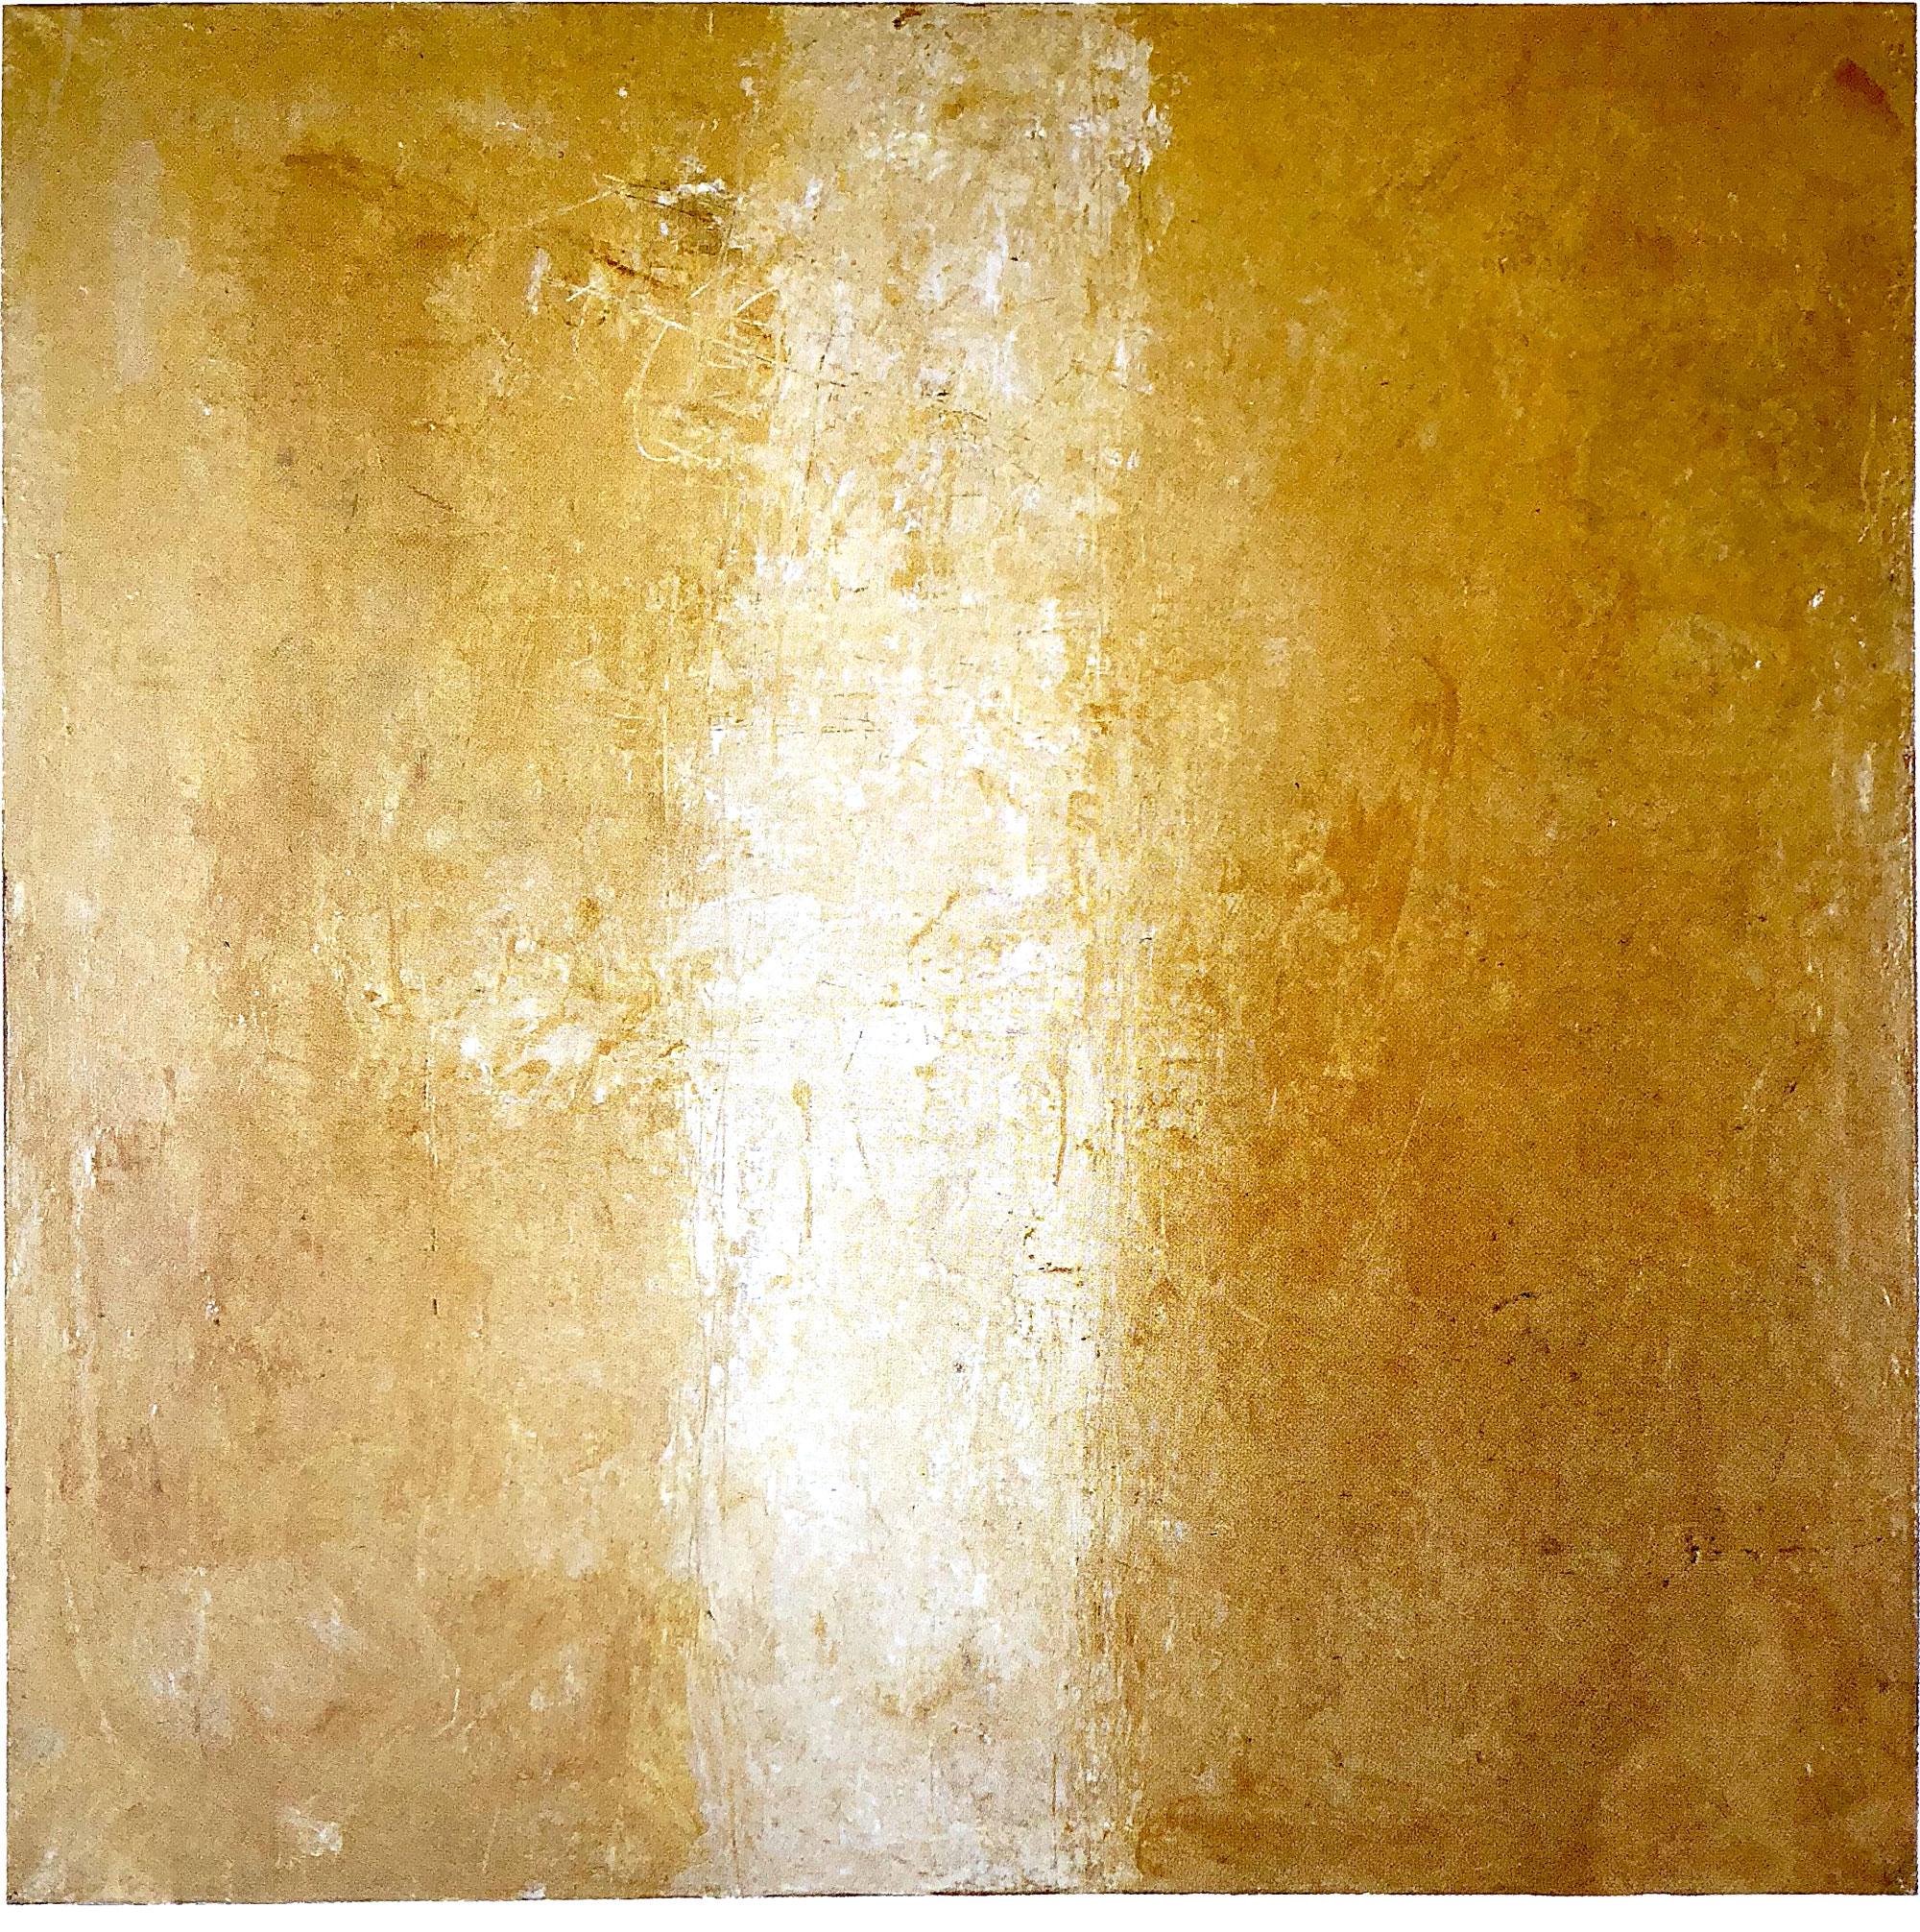 Monochrom-ohne-Titel-3-Öl-auf-Leinwand-150×150-1995